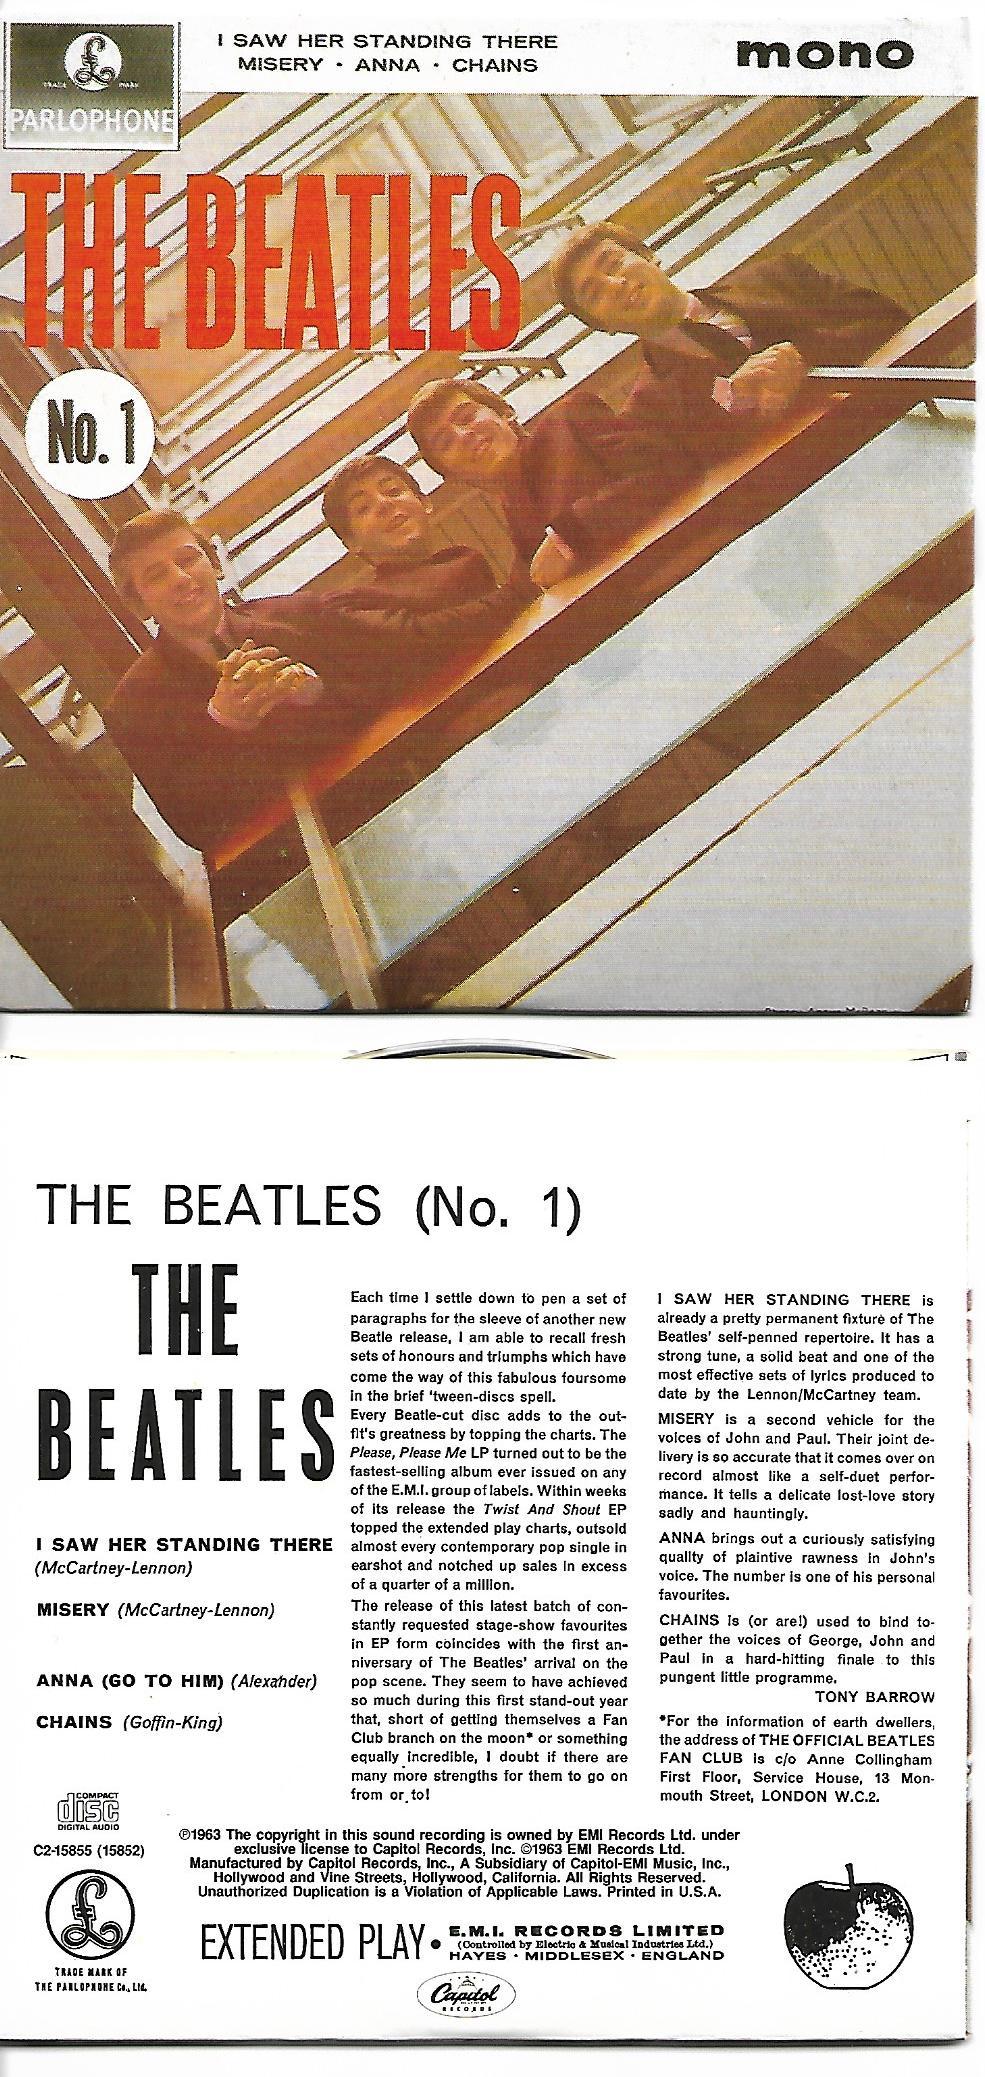 THE BEATLES - The Beatles (N°1) EP 4-TRACK CARD SLEEVE - CD single